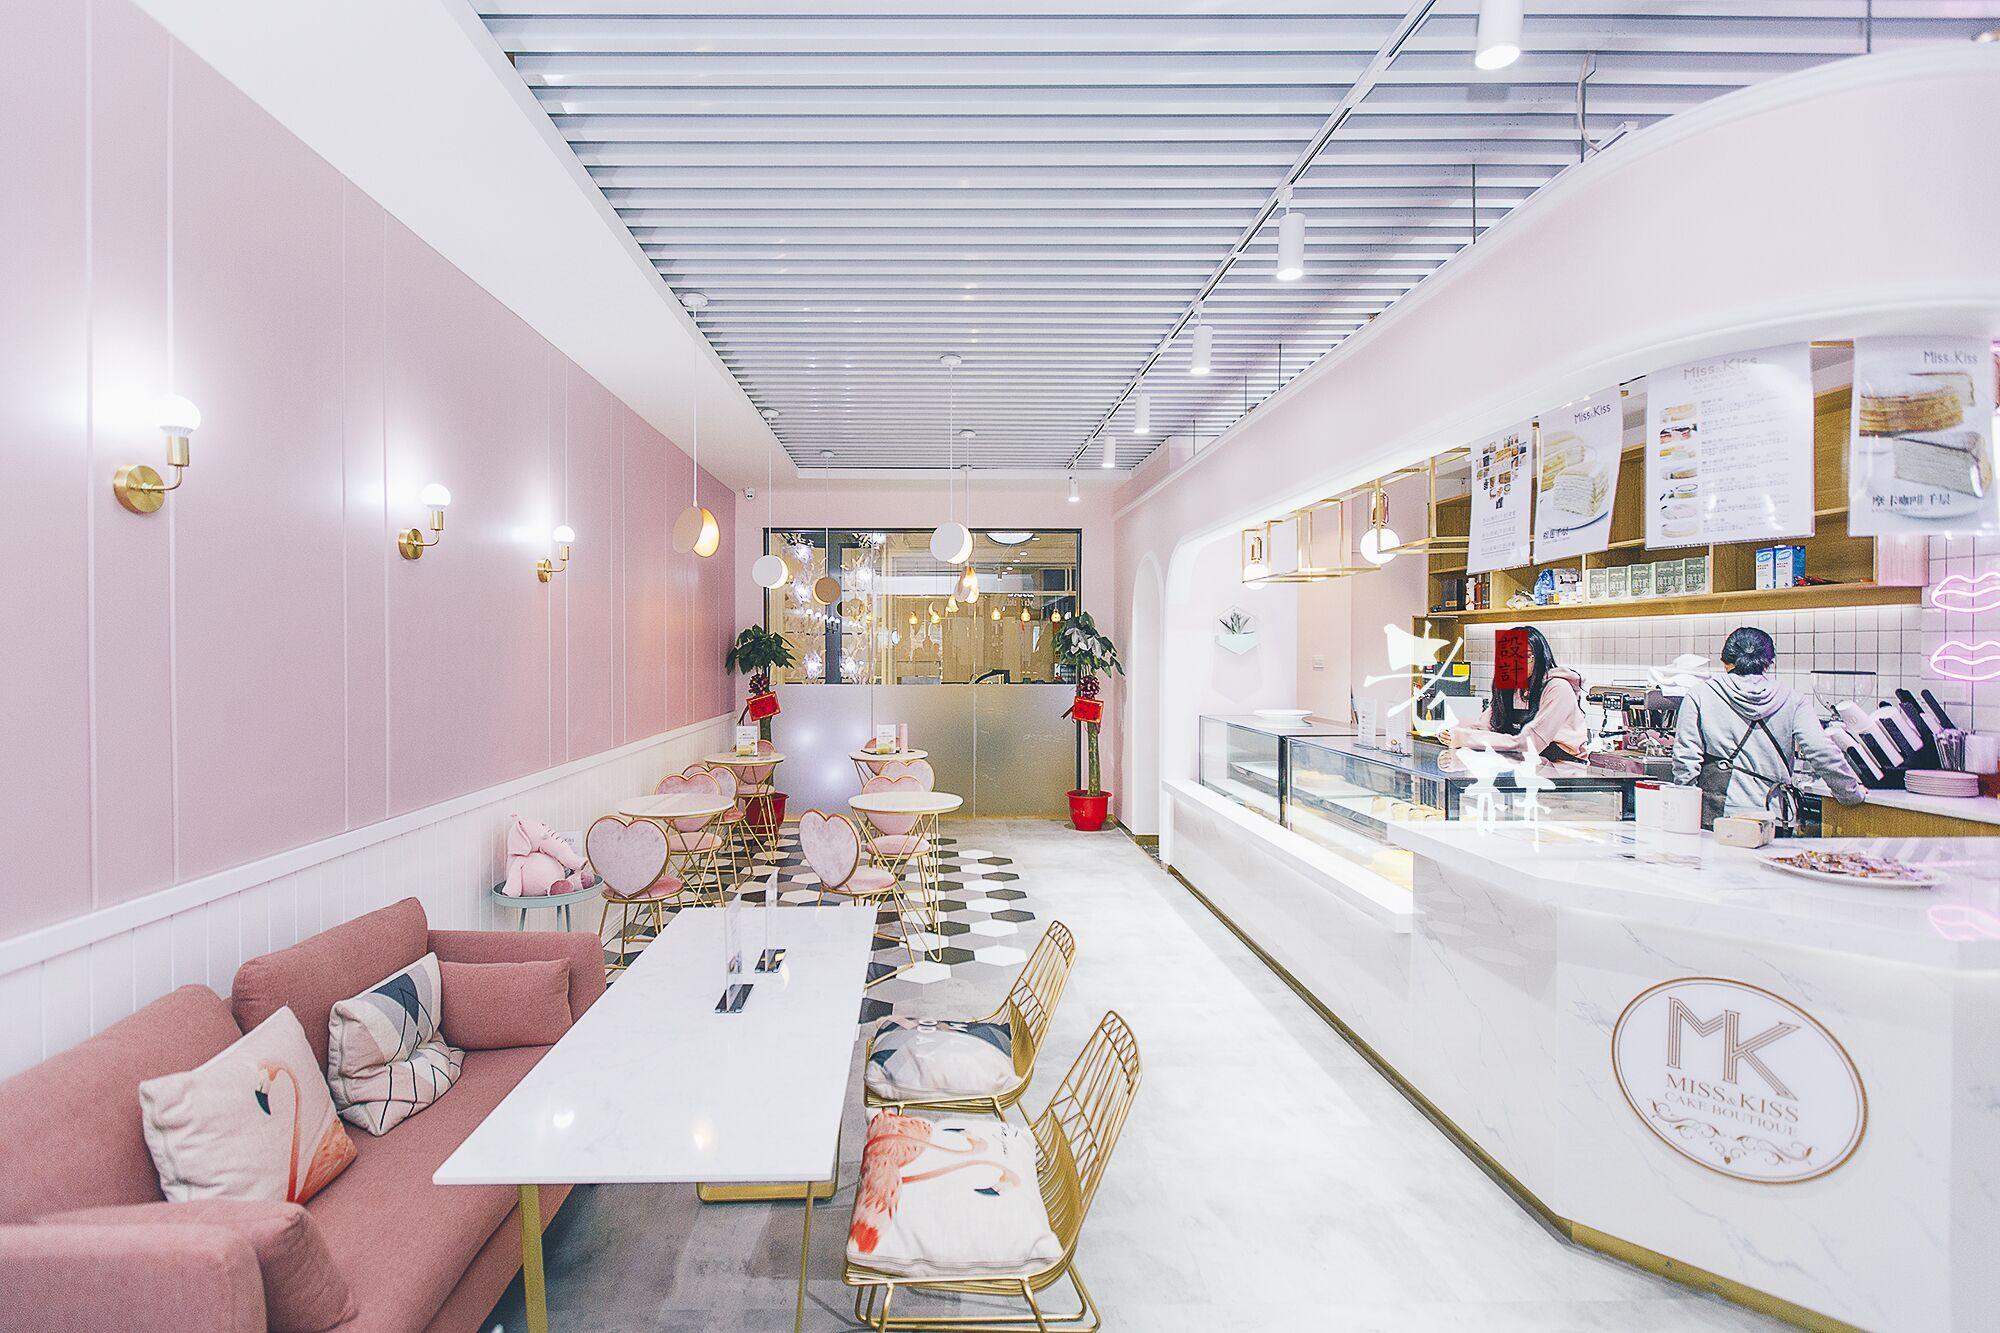 mk蛋糕店设计实景照|空间|室内设计|rohenry - 原创